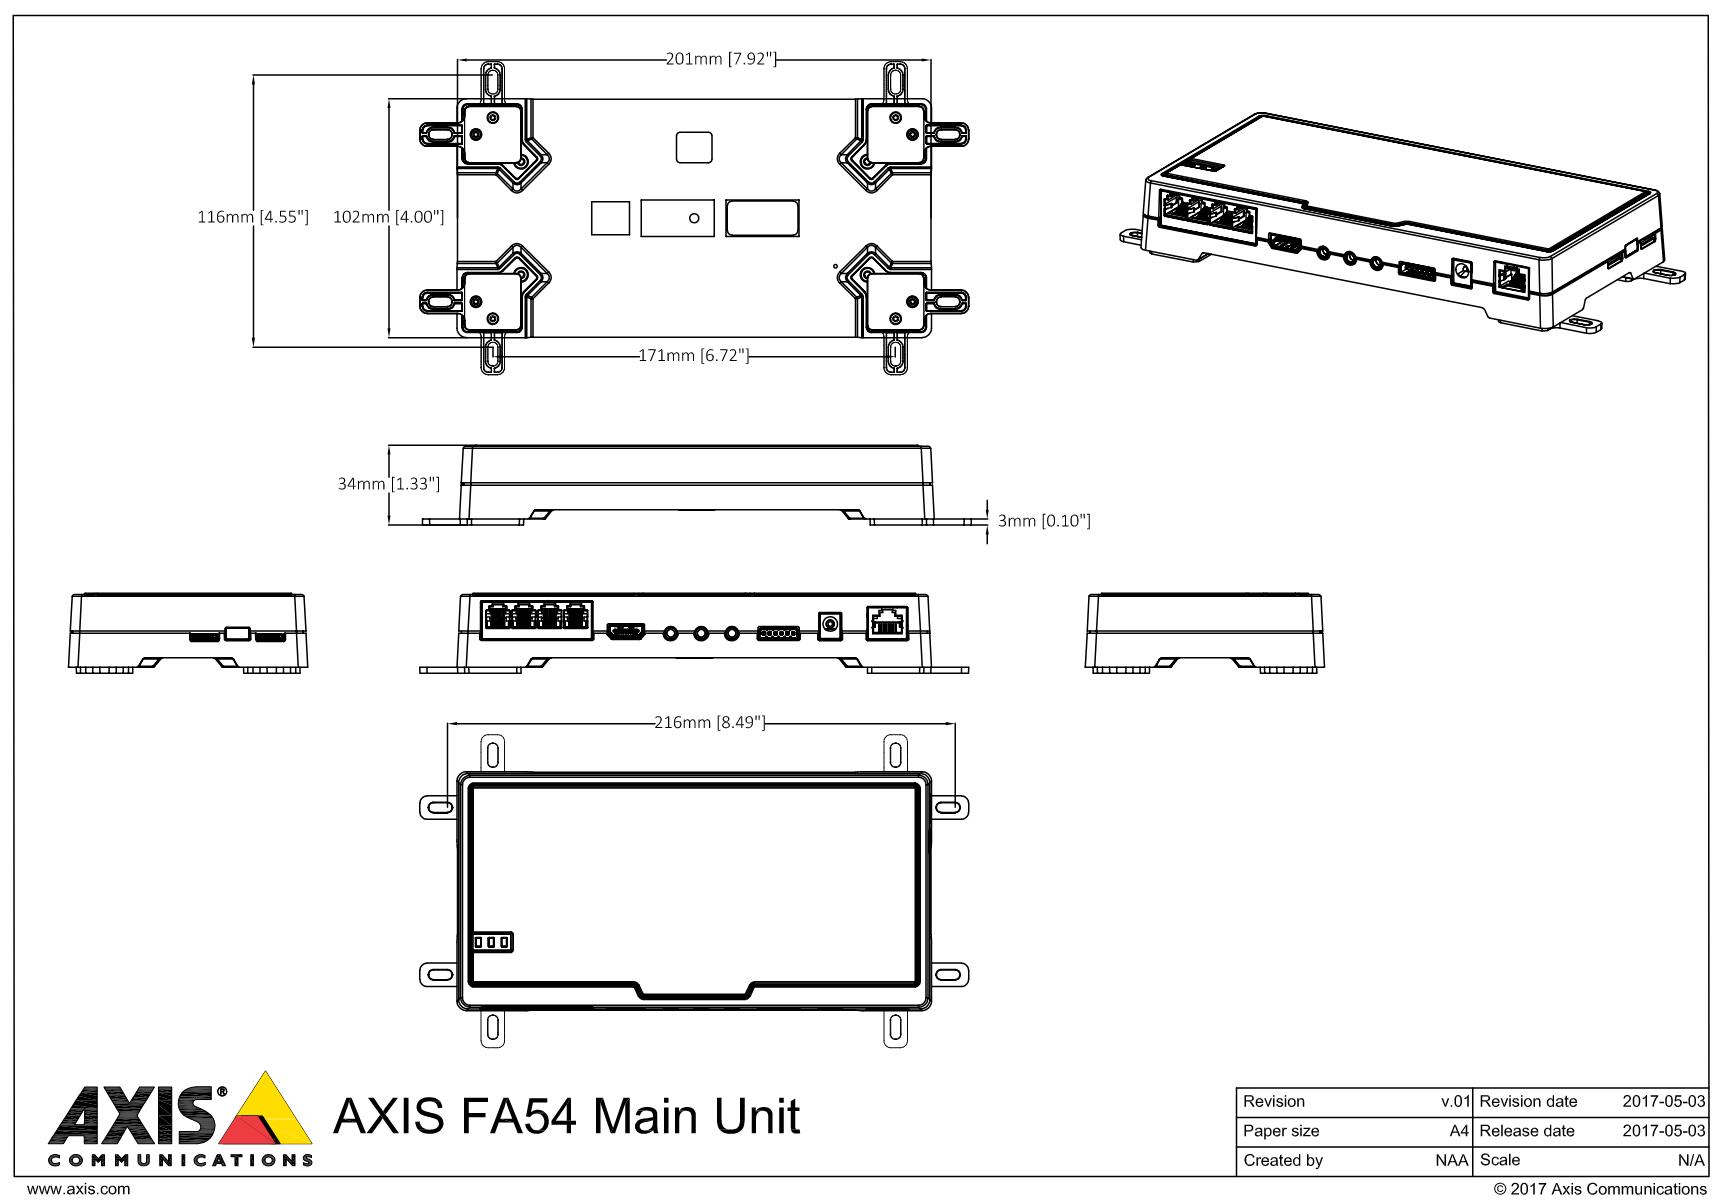 Axis FA54 Dimensions